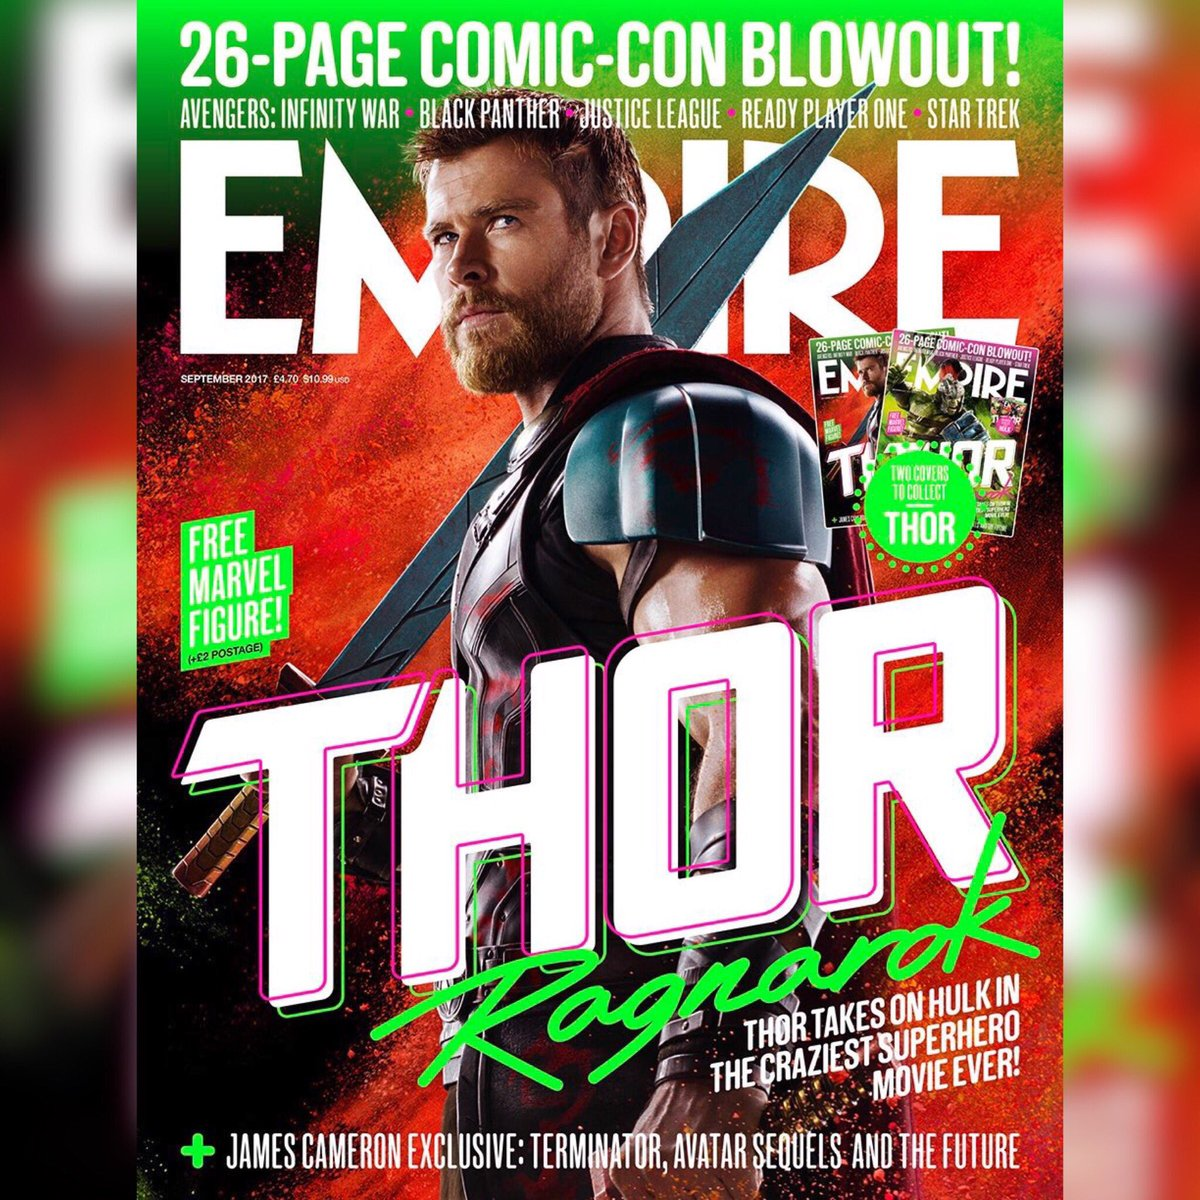 Empire Magazine Covers